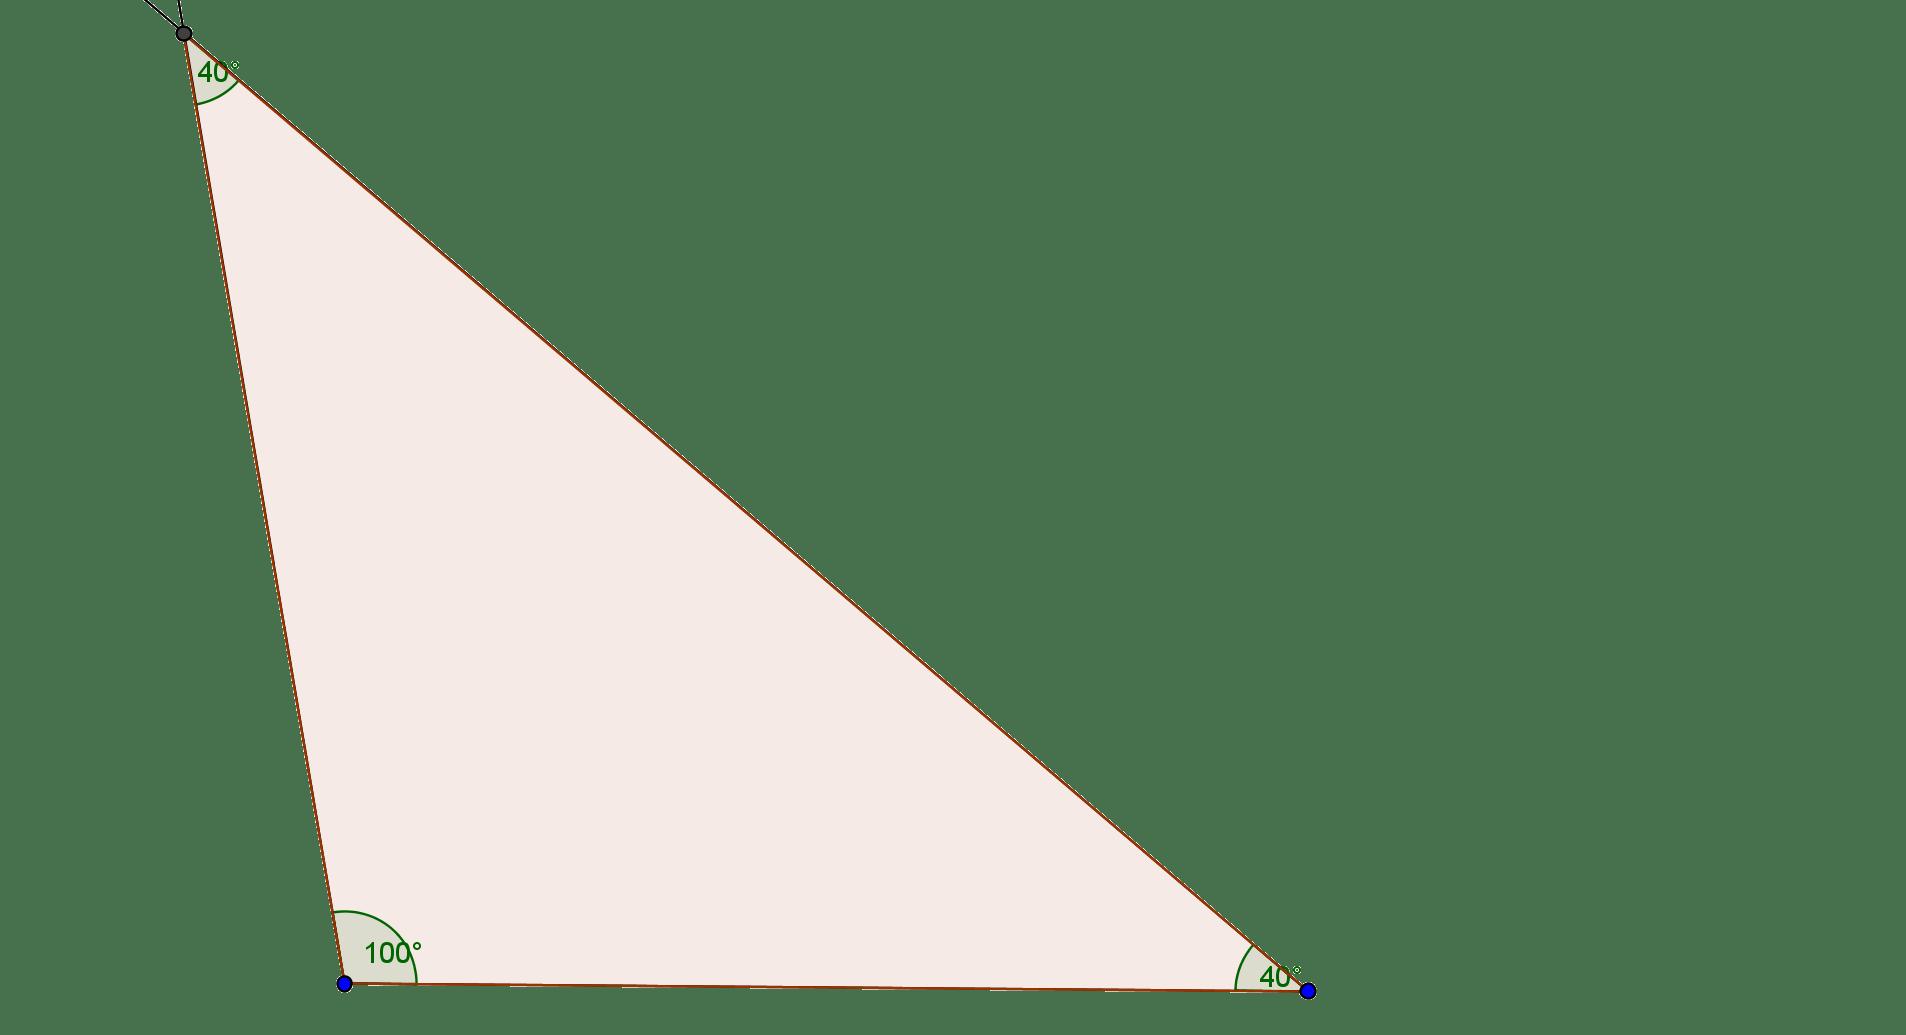 Obtuse Triangle Angles